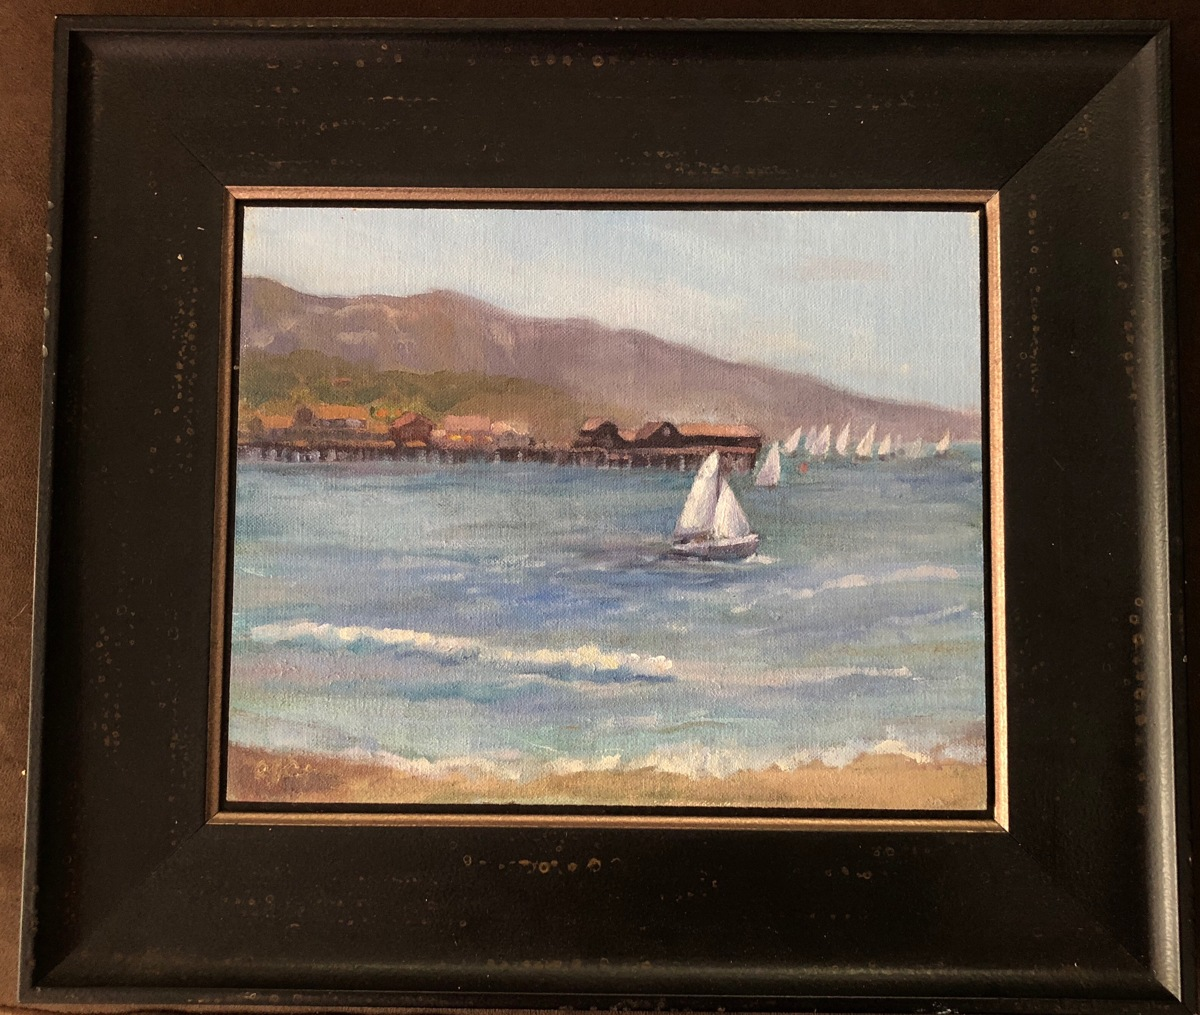 Santa Barbara Regatta (framed) (large view)